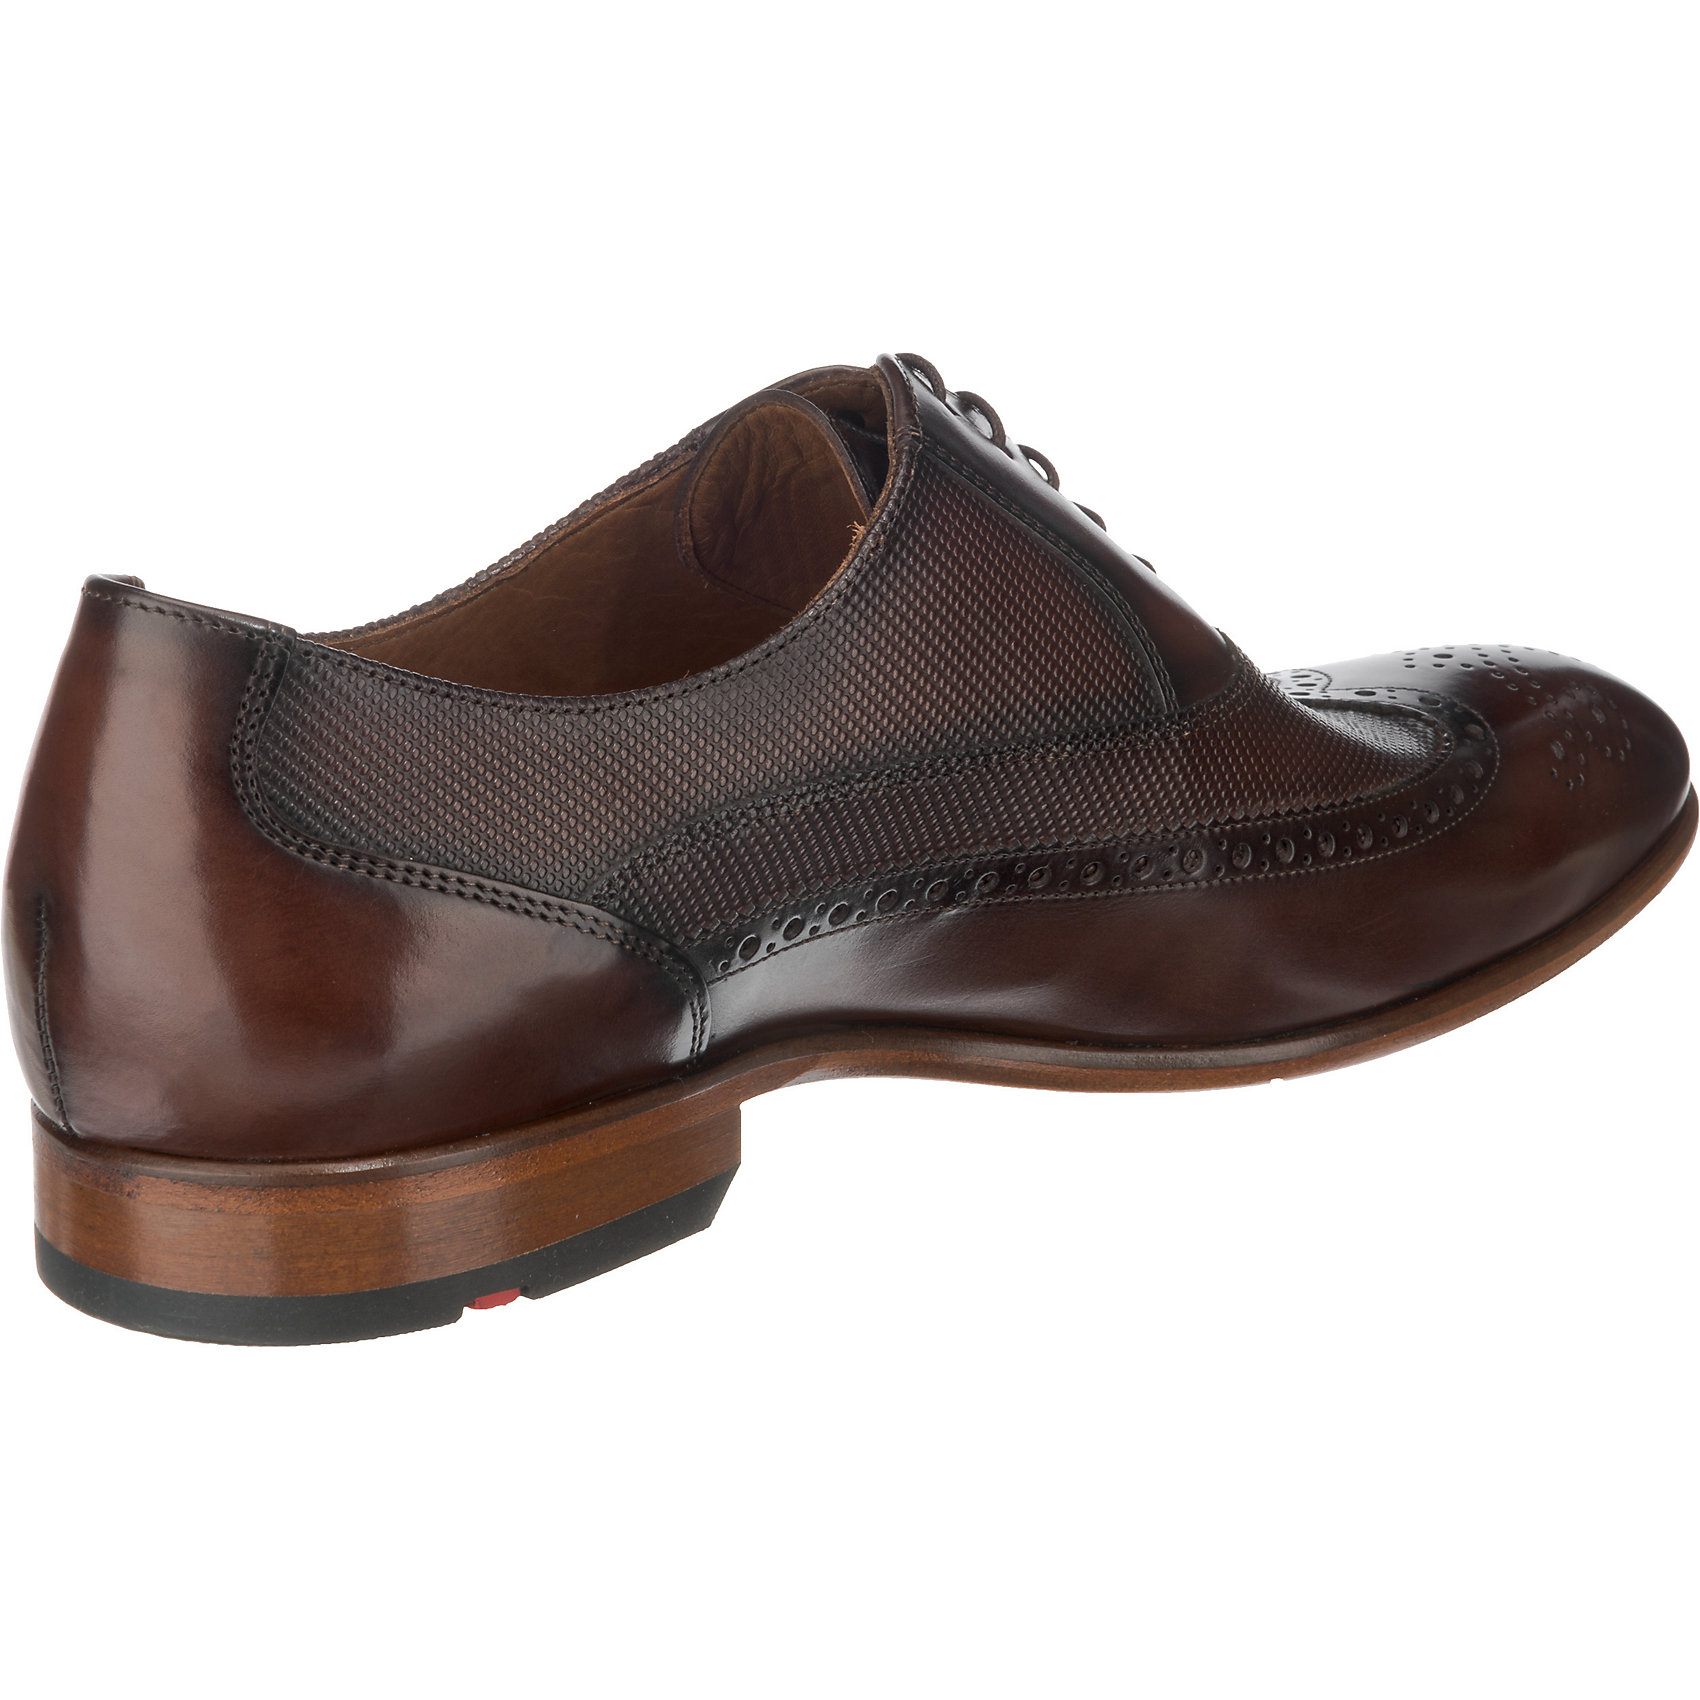 Neu LLOYD Herren OCTAVIO Business-Schnürschuhe 7394768 für Herren LLOYD 4806eb